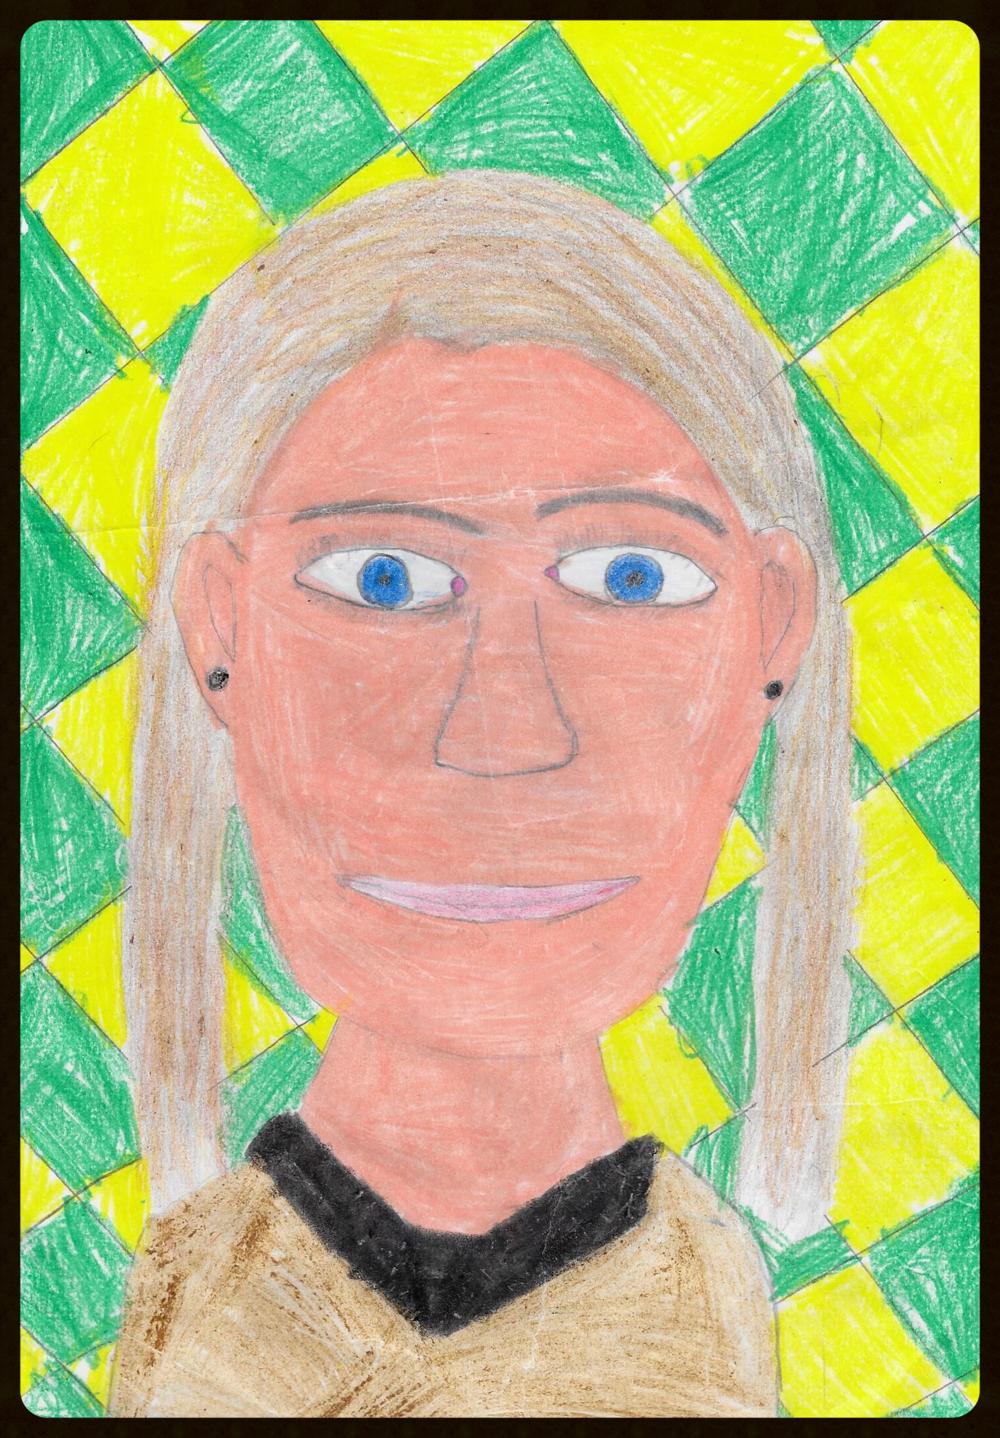 Ms. E O'Reilly   - 5th Class Teacher